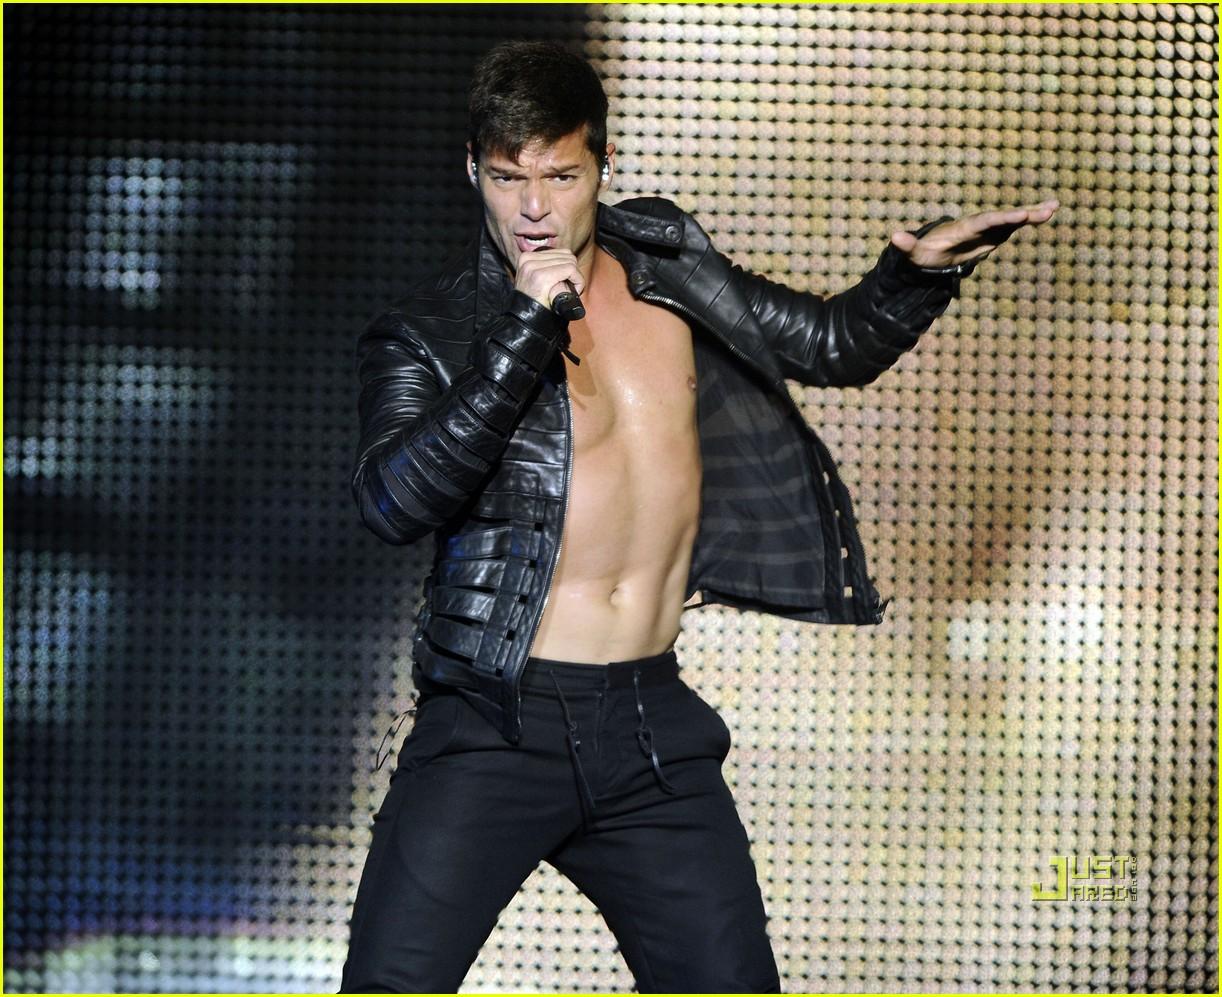 Ricky Martin Bares Chest At Concert Photo 2559714 Ricky